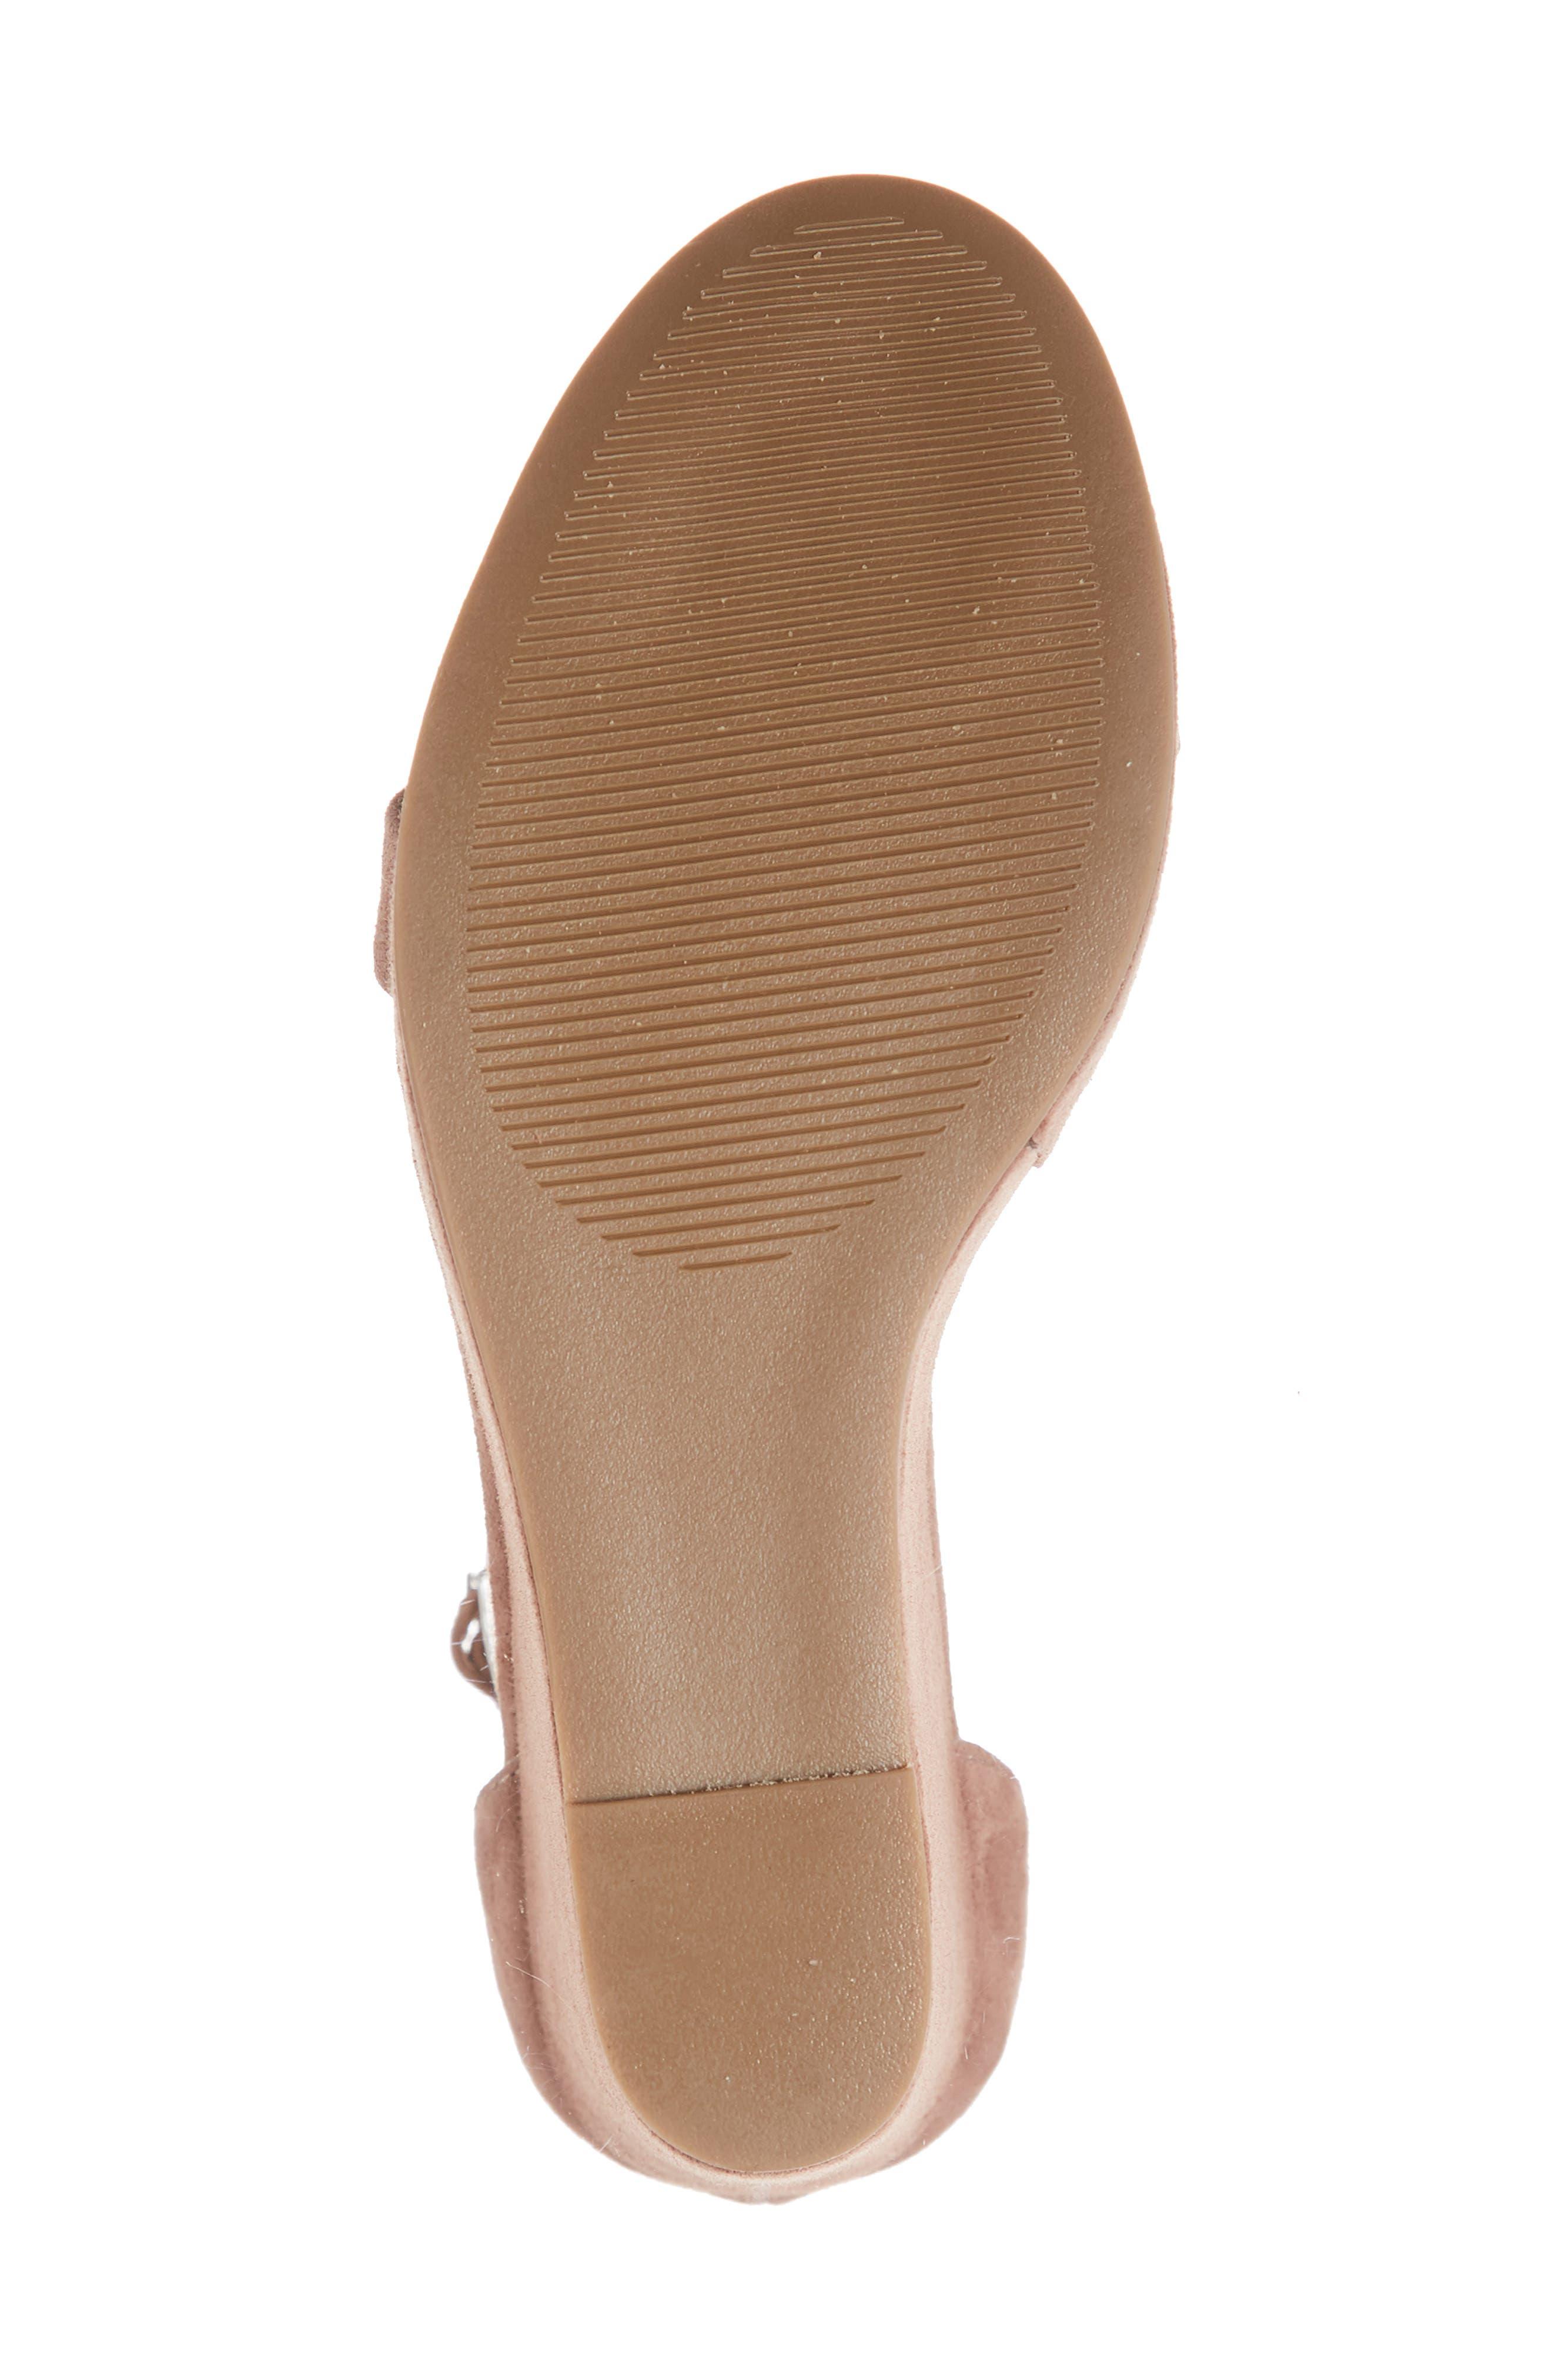 Succeed Platform Wedge Sandal,                             Alternate thumbnail 6, color,                             TAN SUEDE